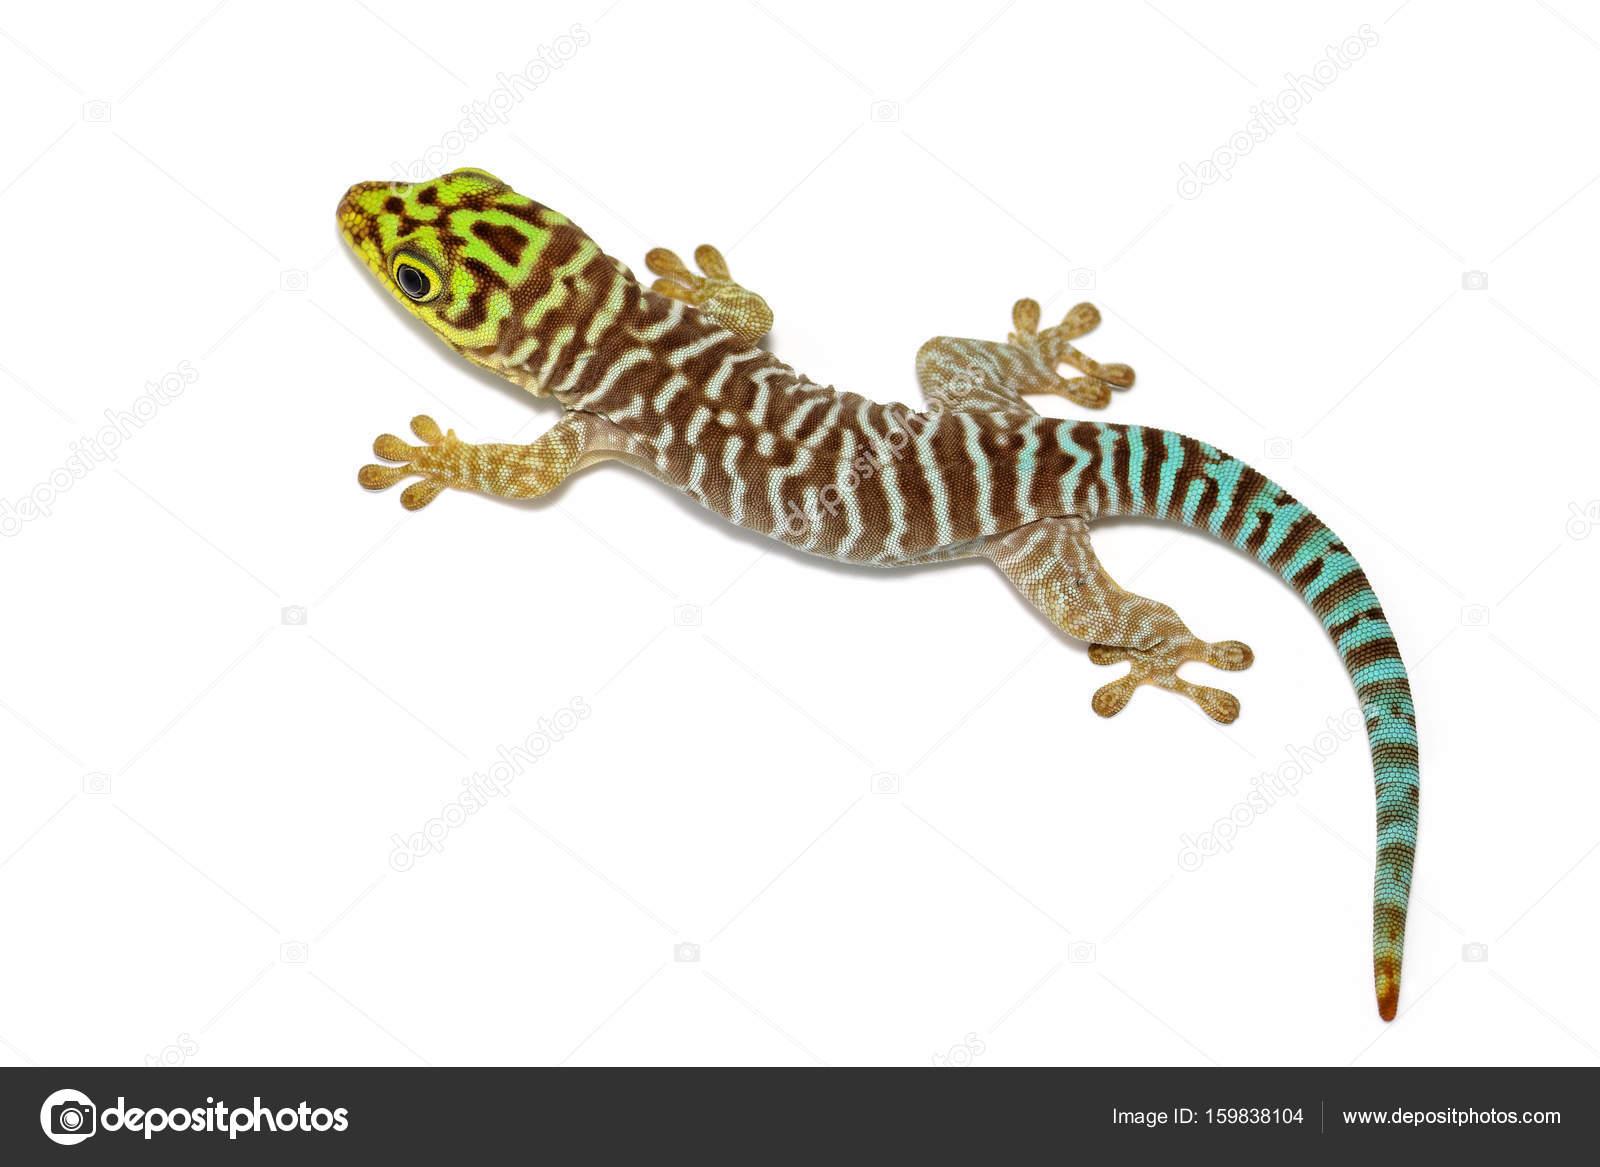 phelsuma standingi gekko stock photo valt ahyppo 159838104